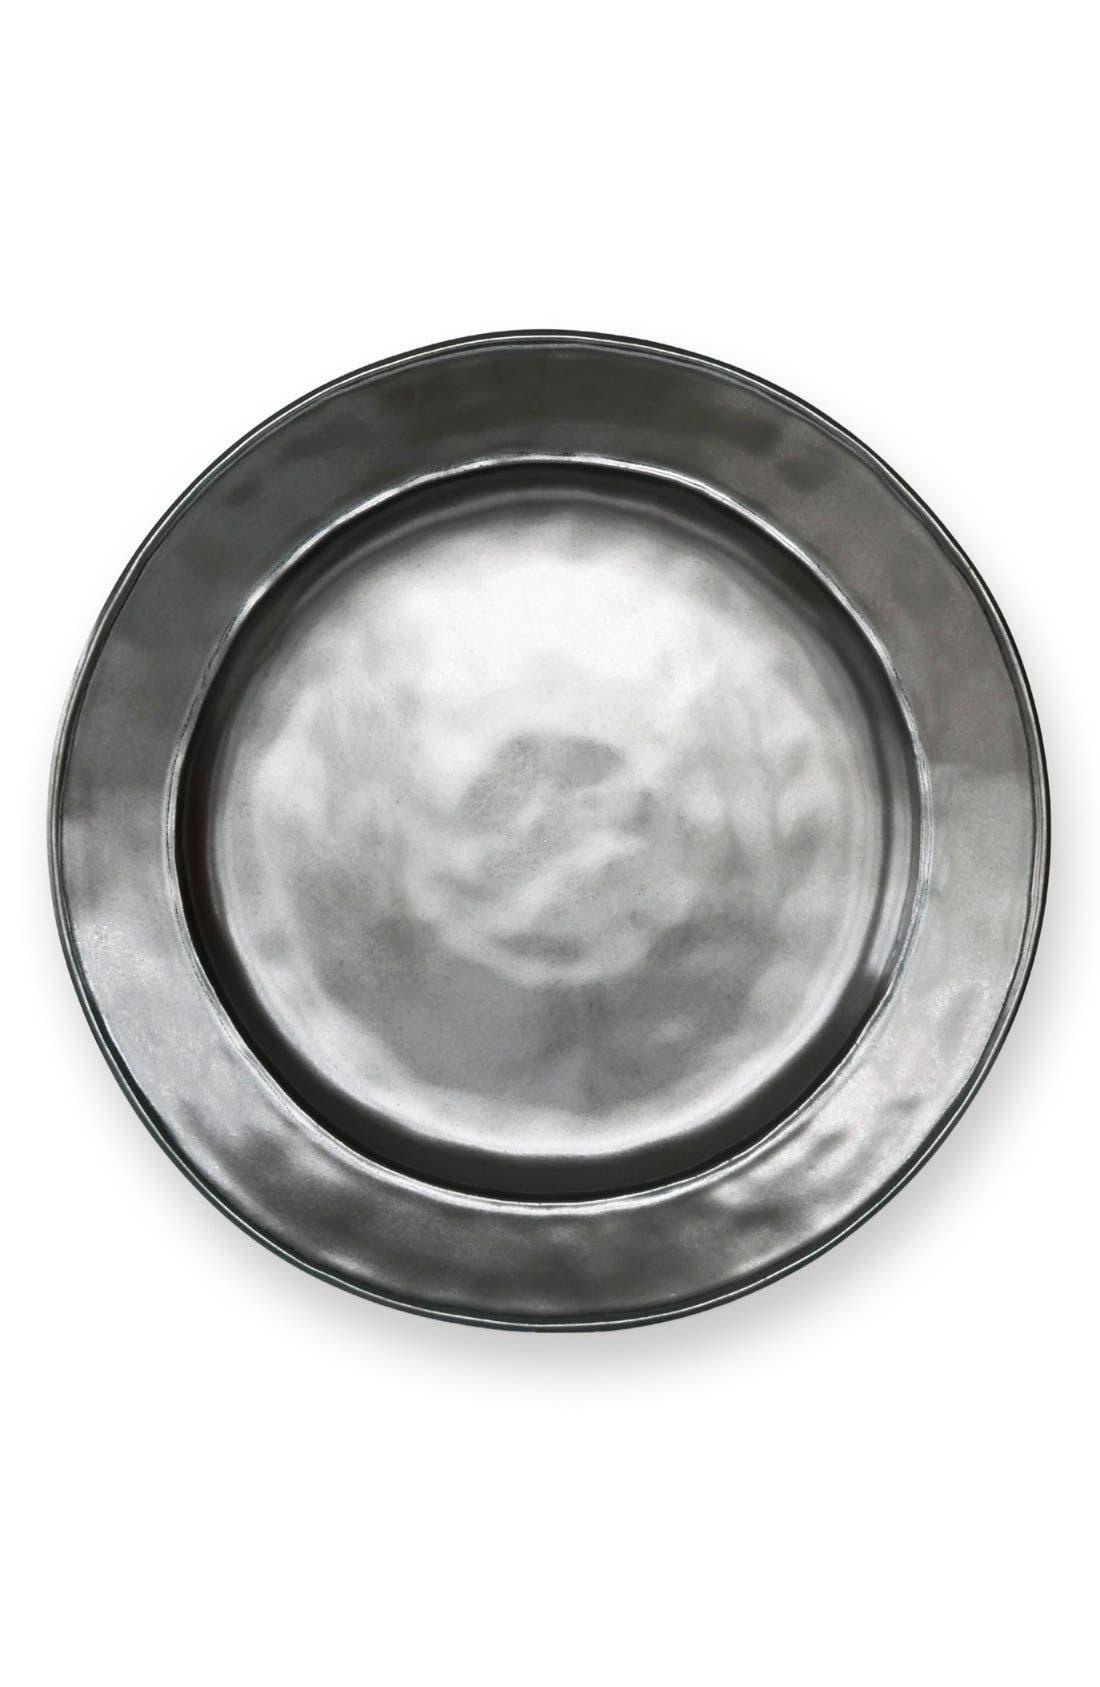 Main Image - Juliska \u0027Pewter\u0027 Stoneware Dinner Plate  sc 1 st  Nordstrom & Juliska \u0027Pewter\u0027 Stoneware Dinner Plate | Nordstrom